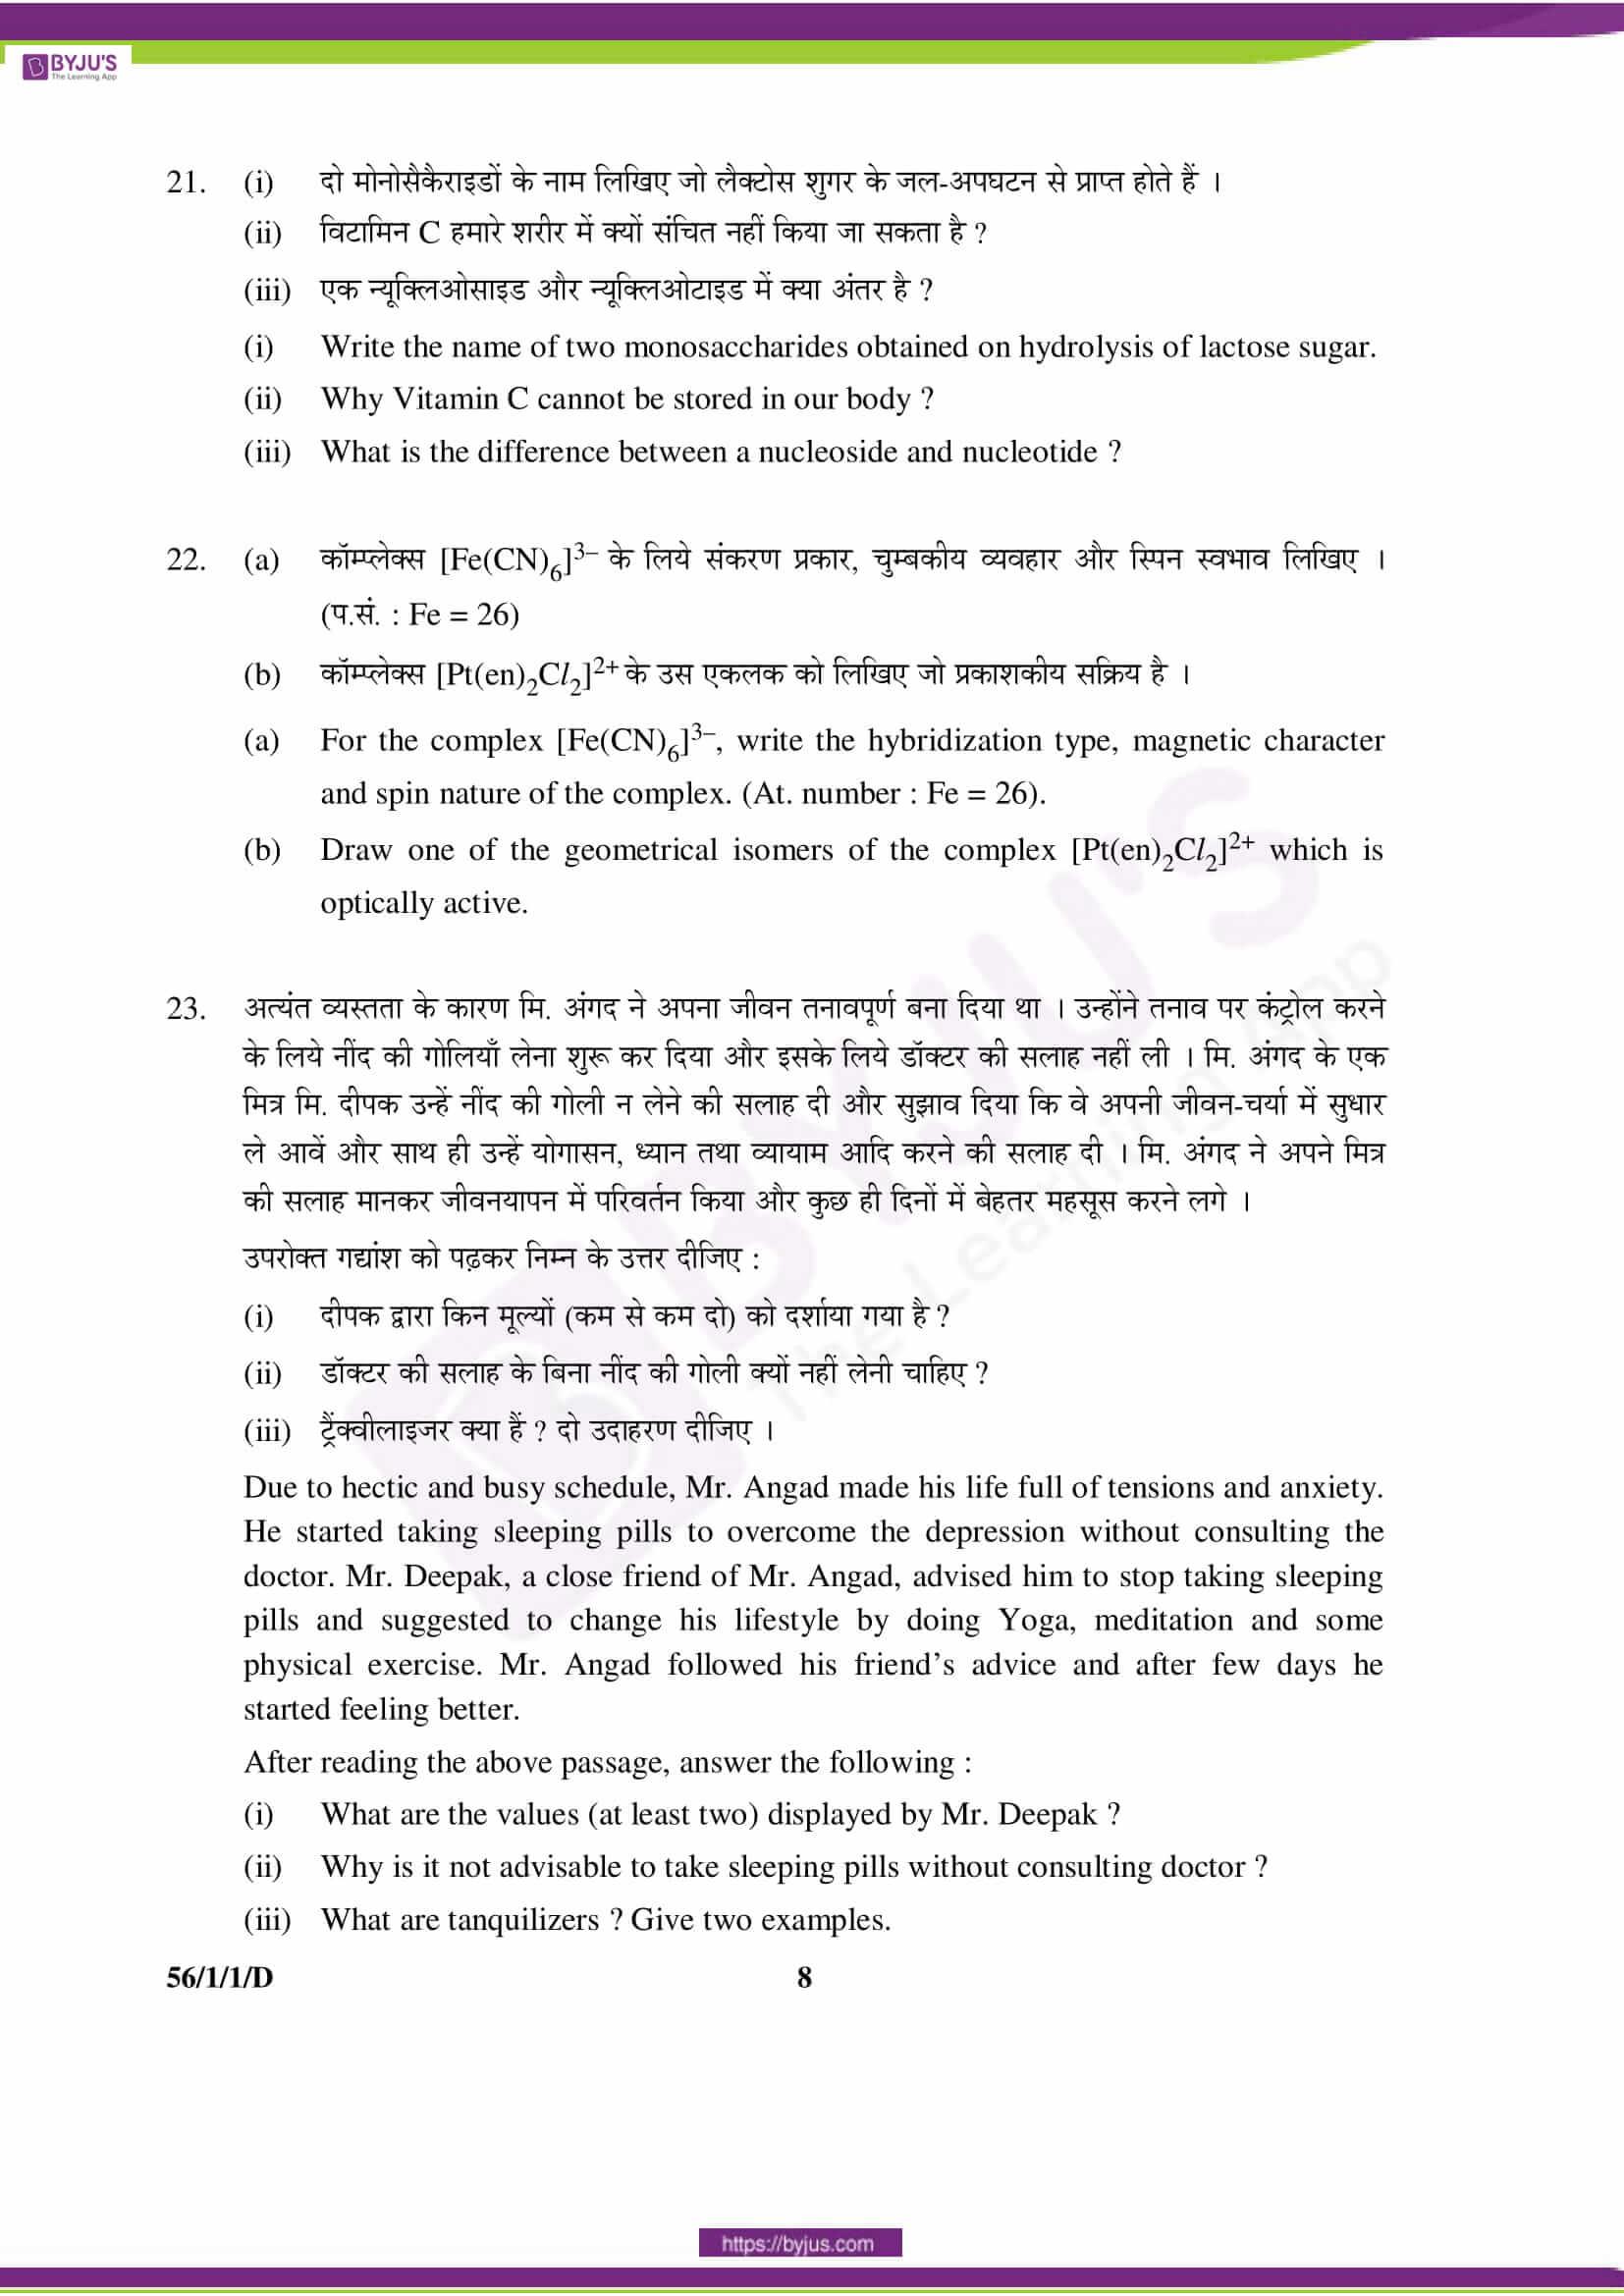 cbse class 12 qs paper 2016 chemistry set 1